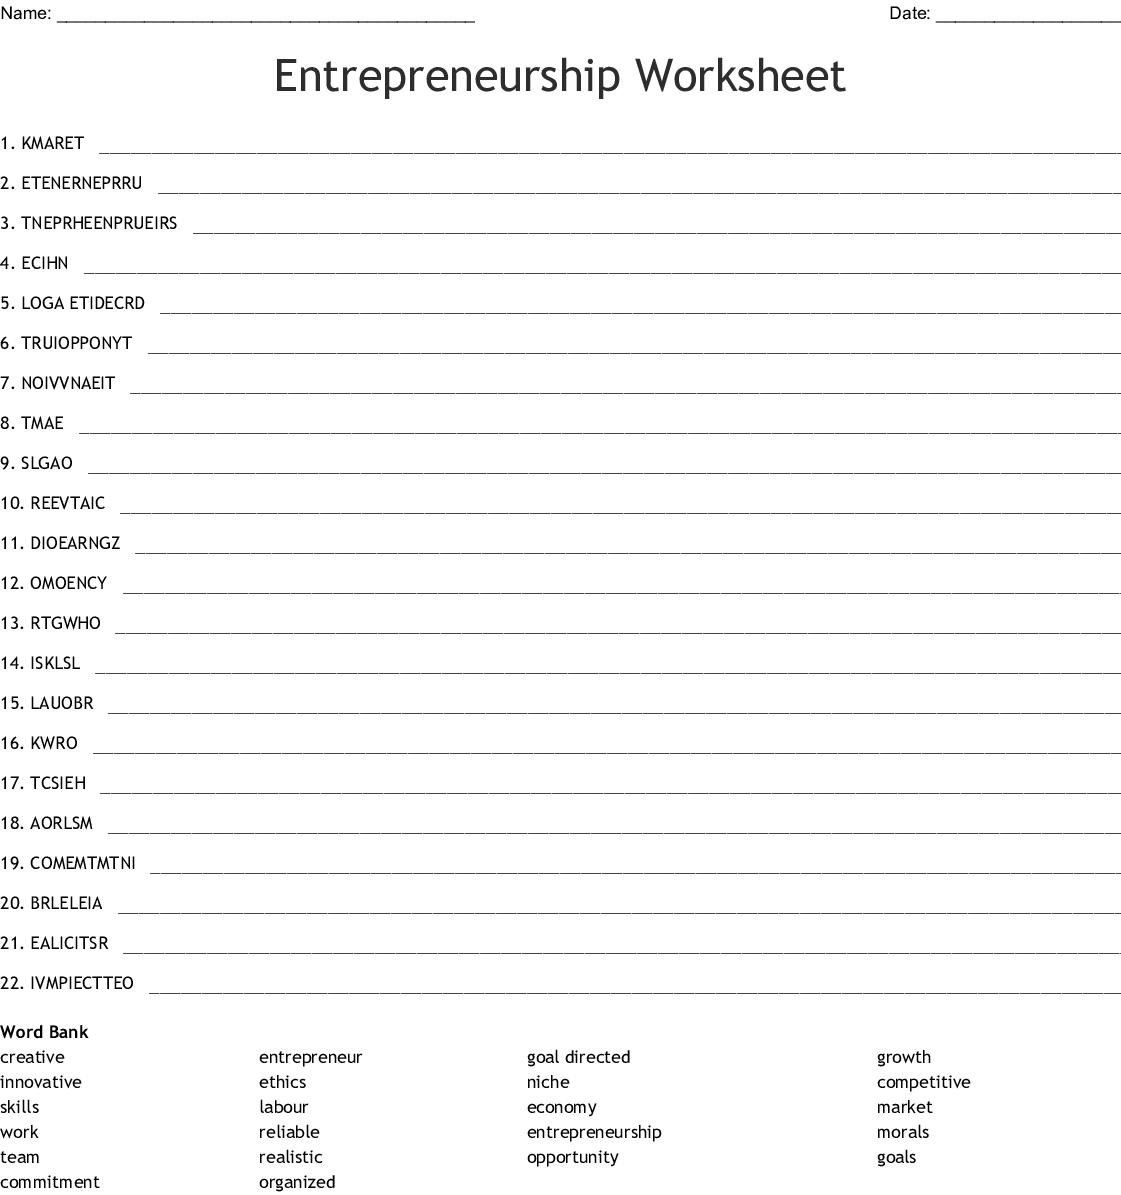 Entrepreneurship Worksheet Word Scramble